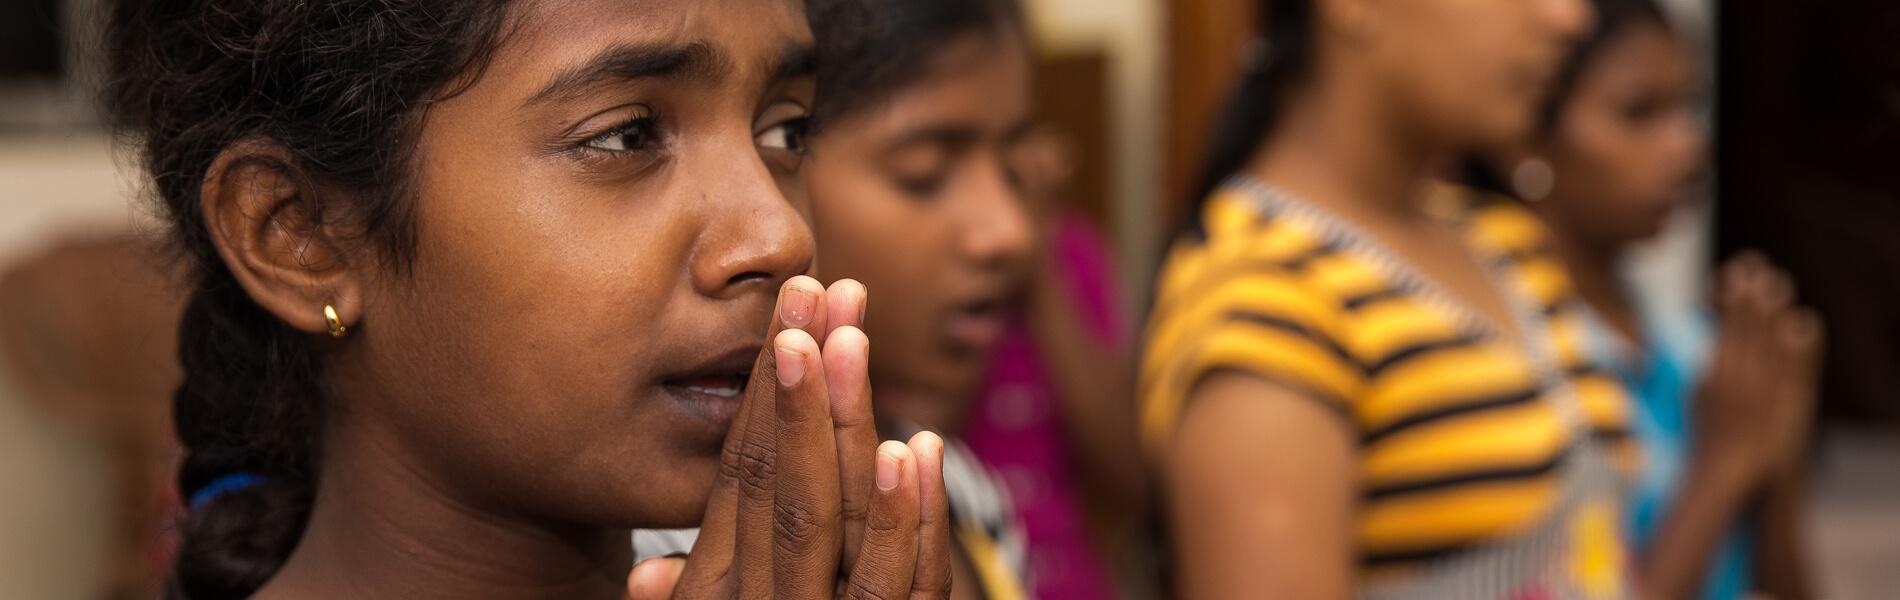 Sri Lanka nach dem Terror